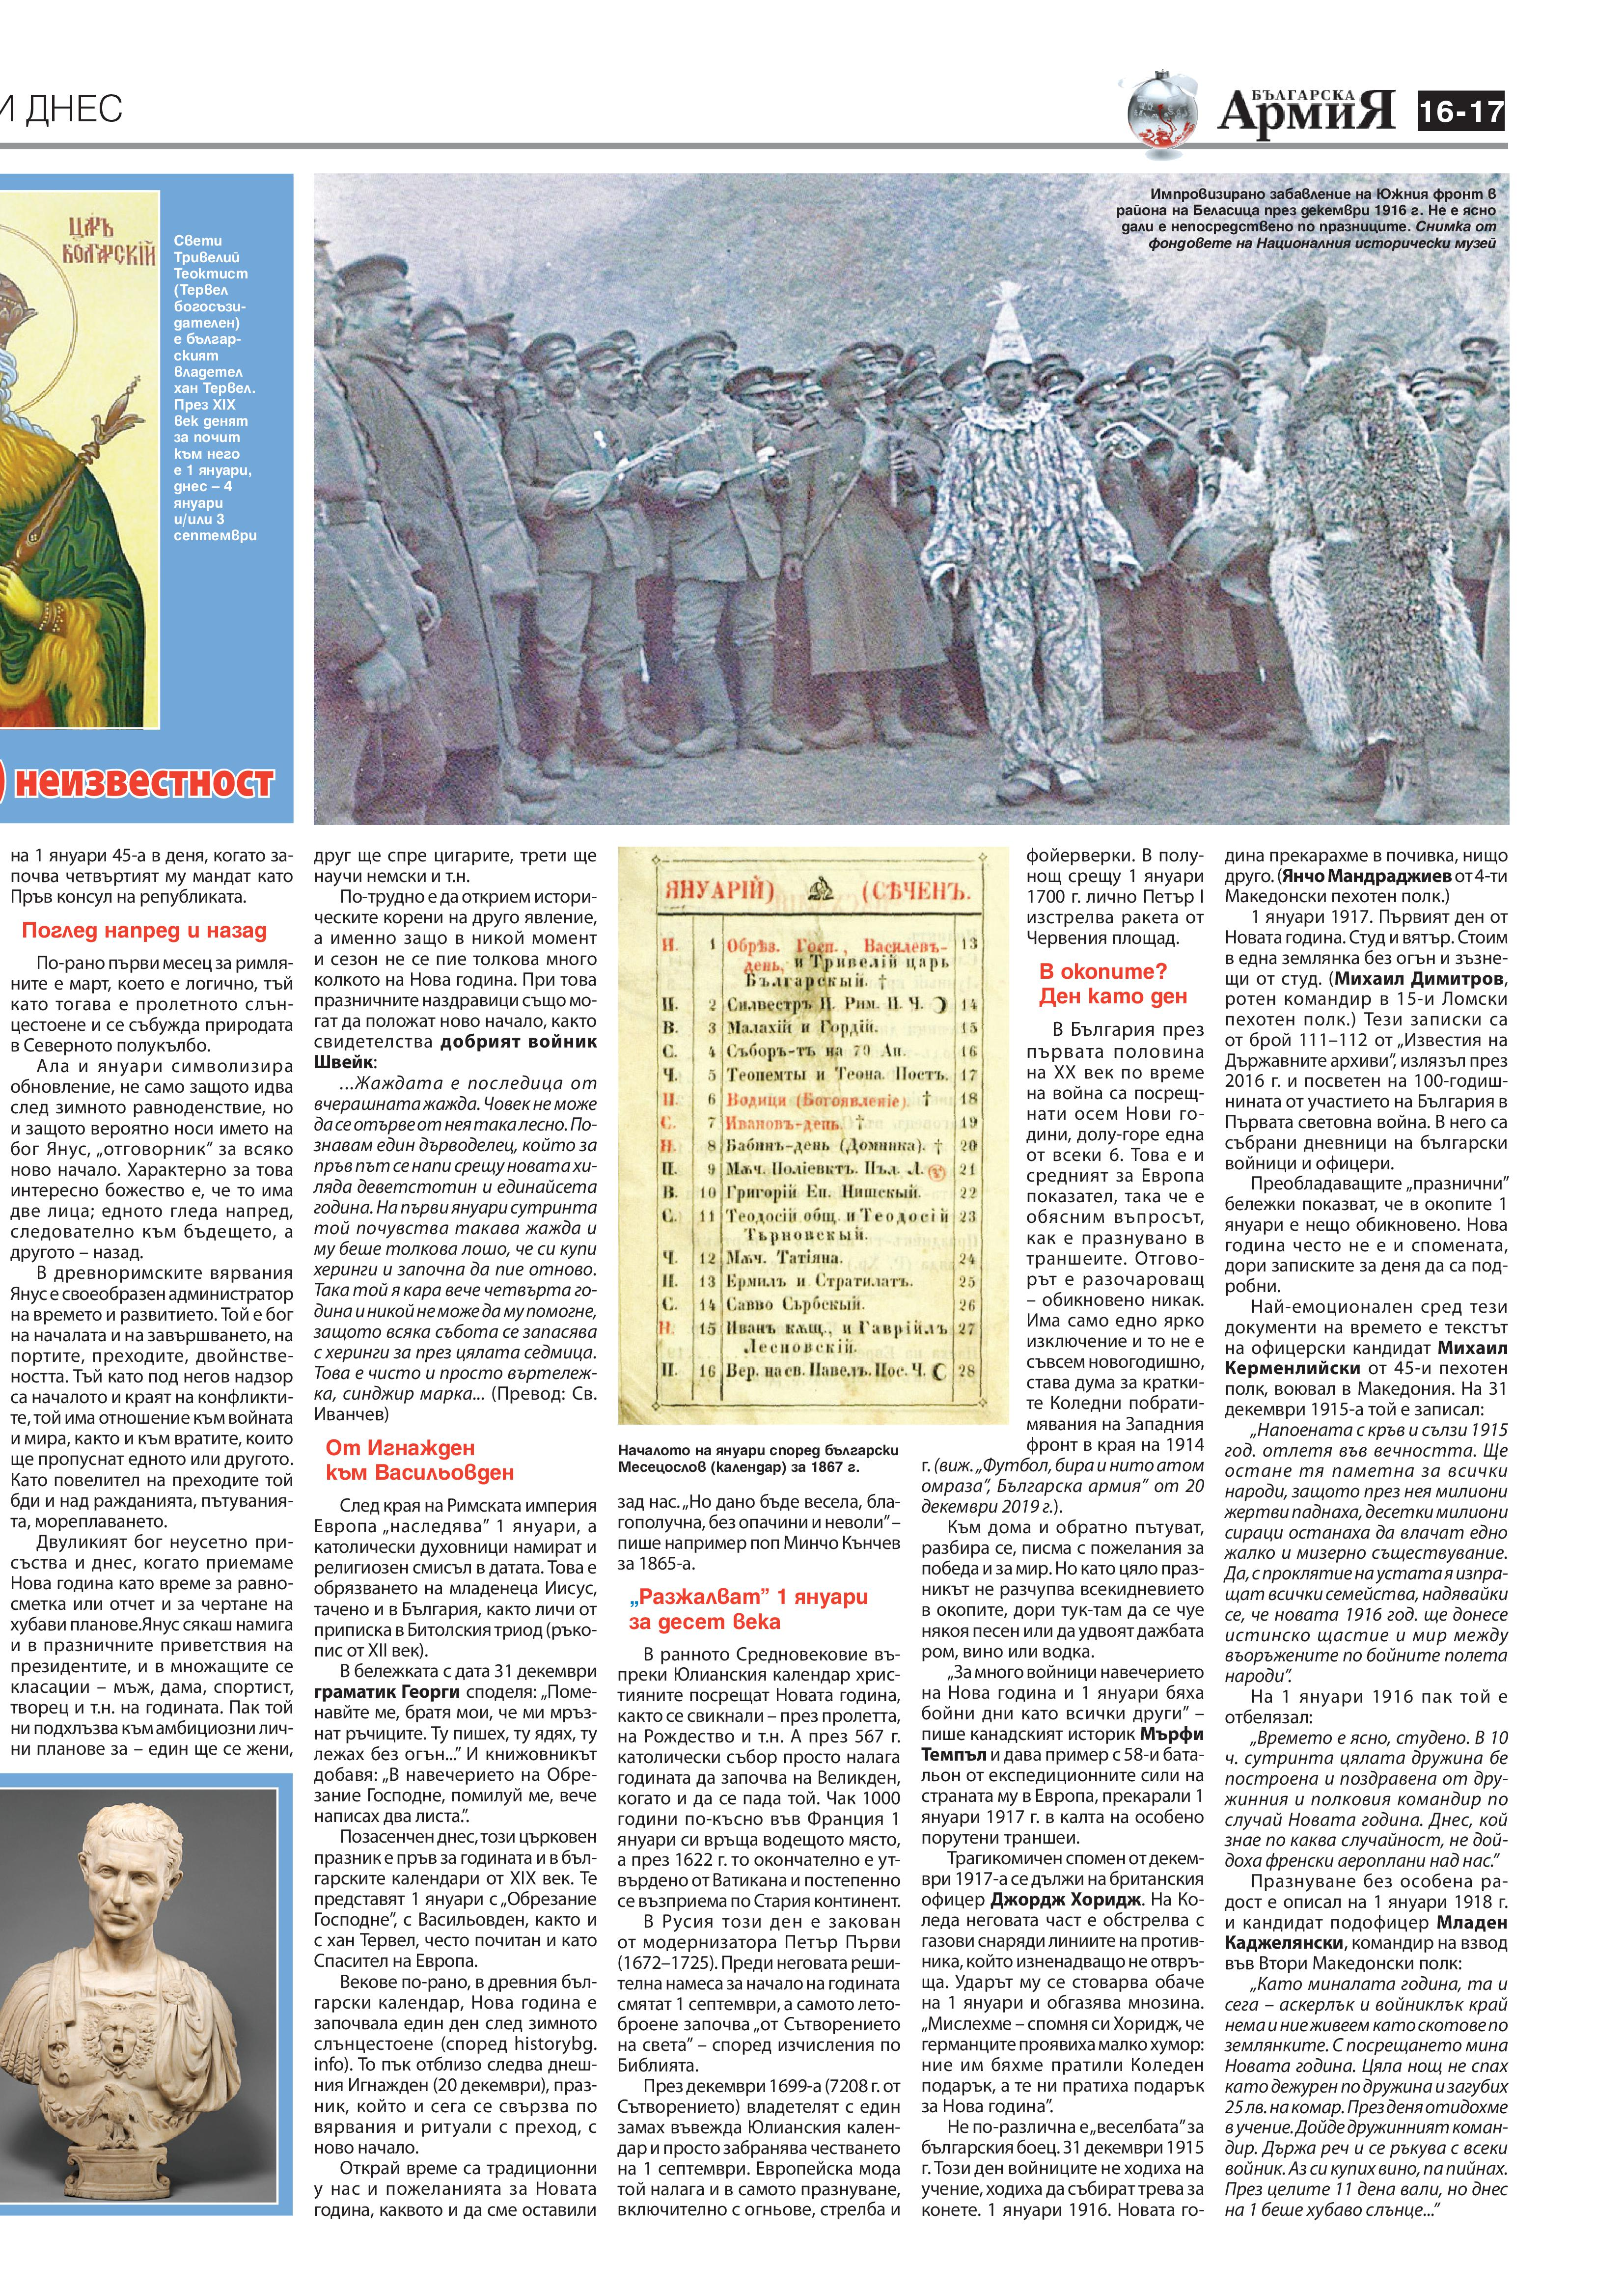 https://www.armymedia.bg/wp-content/uploads/2015/06/17-54.jpg